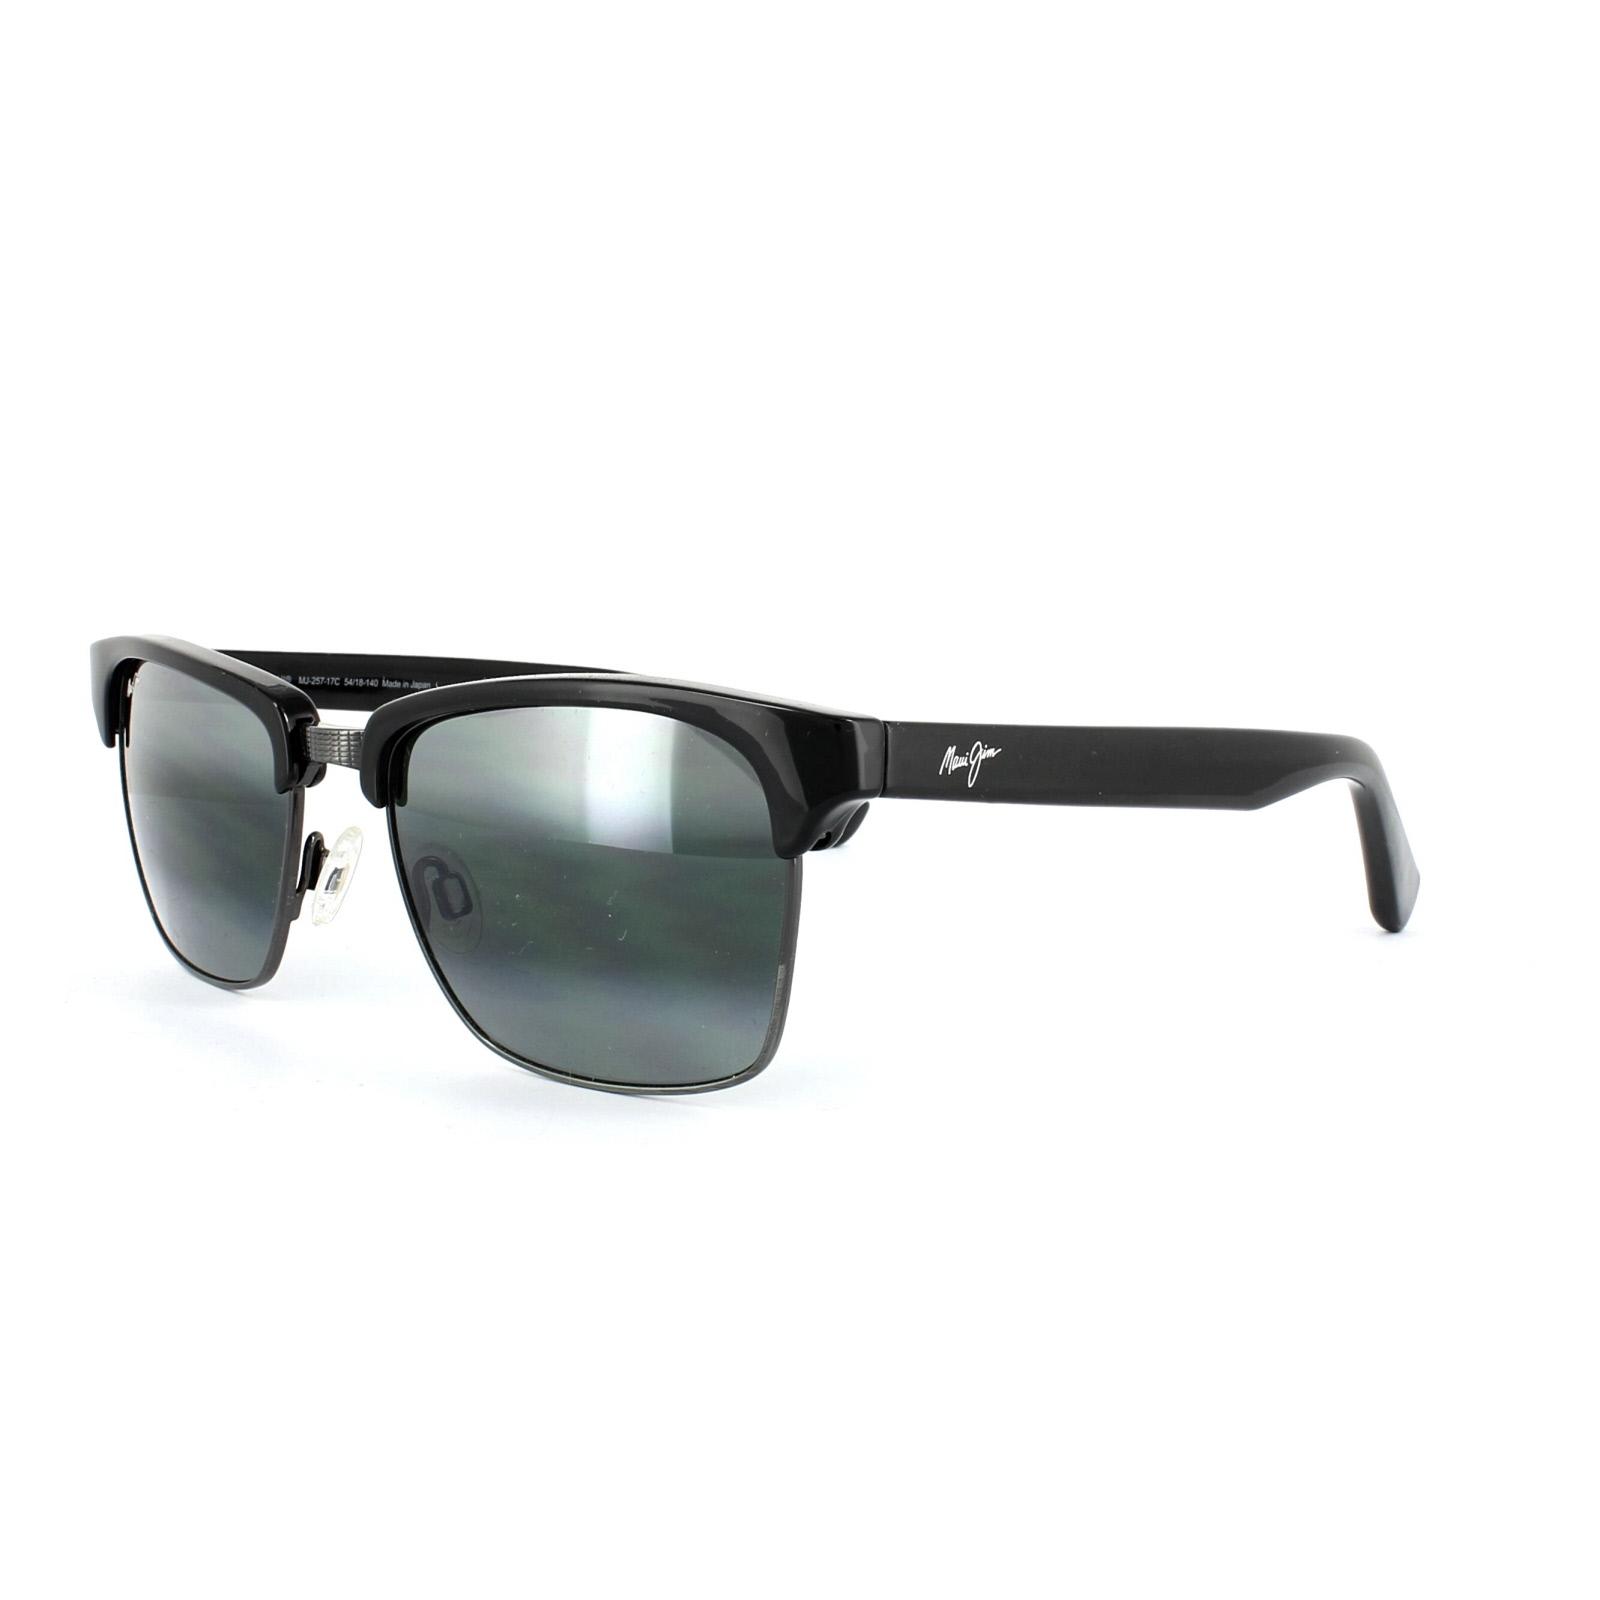 89c1b9cd89f Details about Maui Jim Sunglasses Kawika 257-17C Black Gloss Pewter Neutral  Grey Polarized